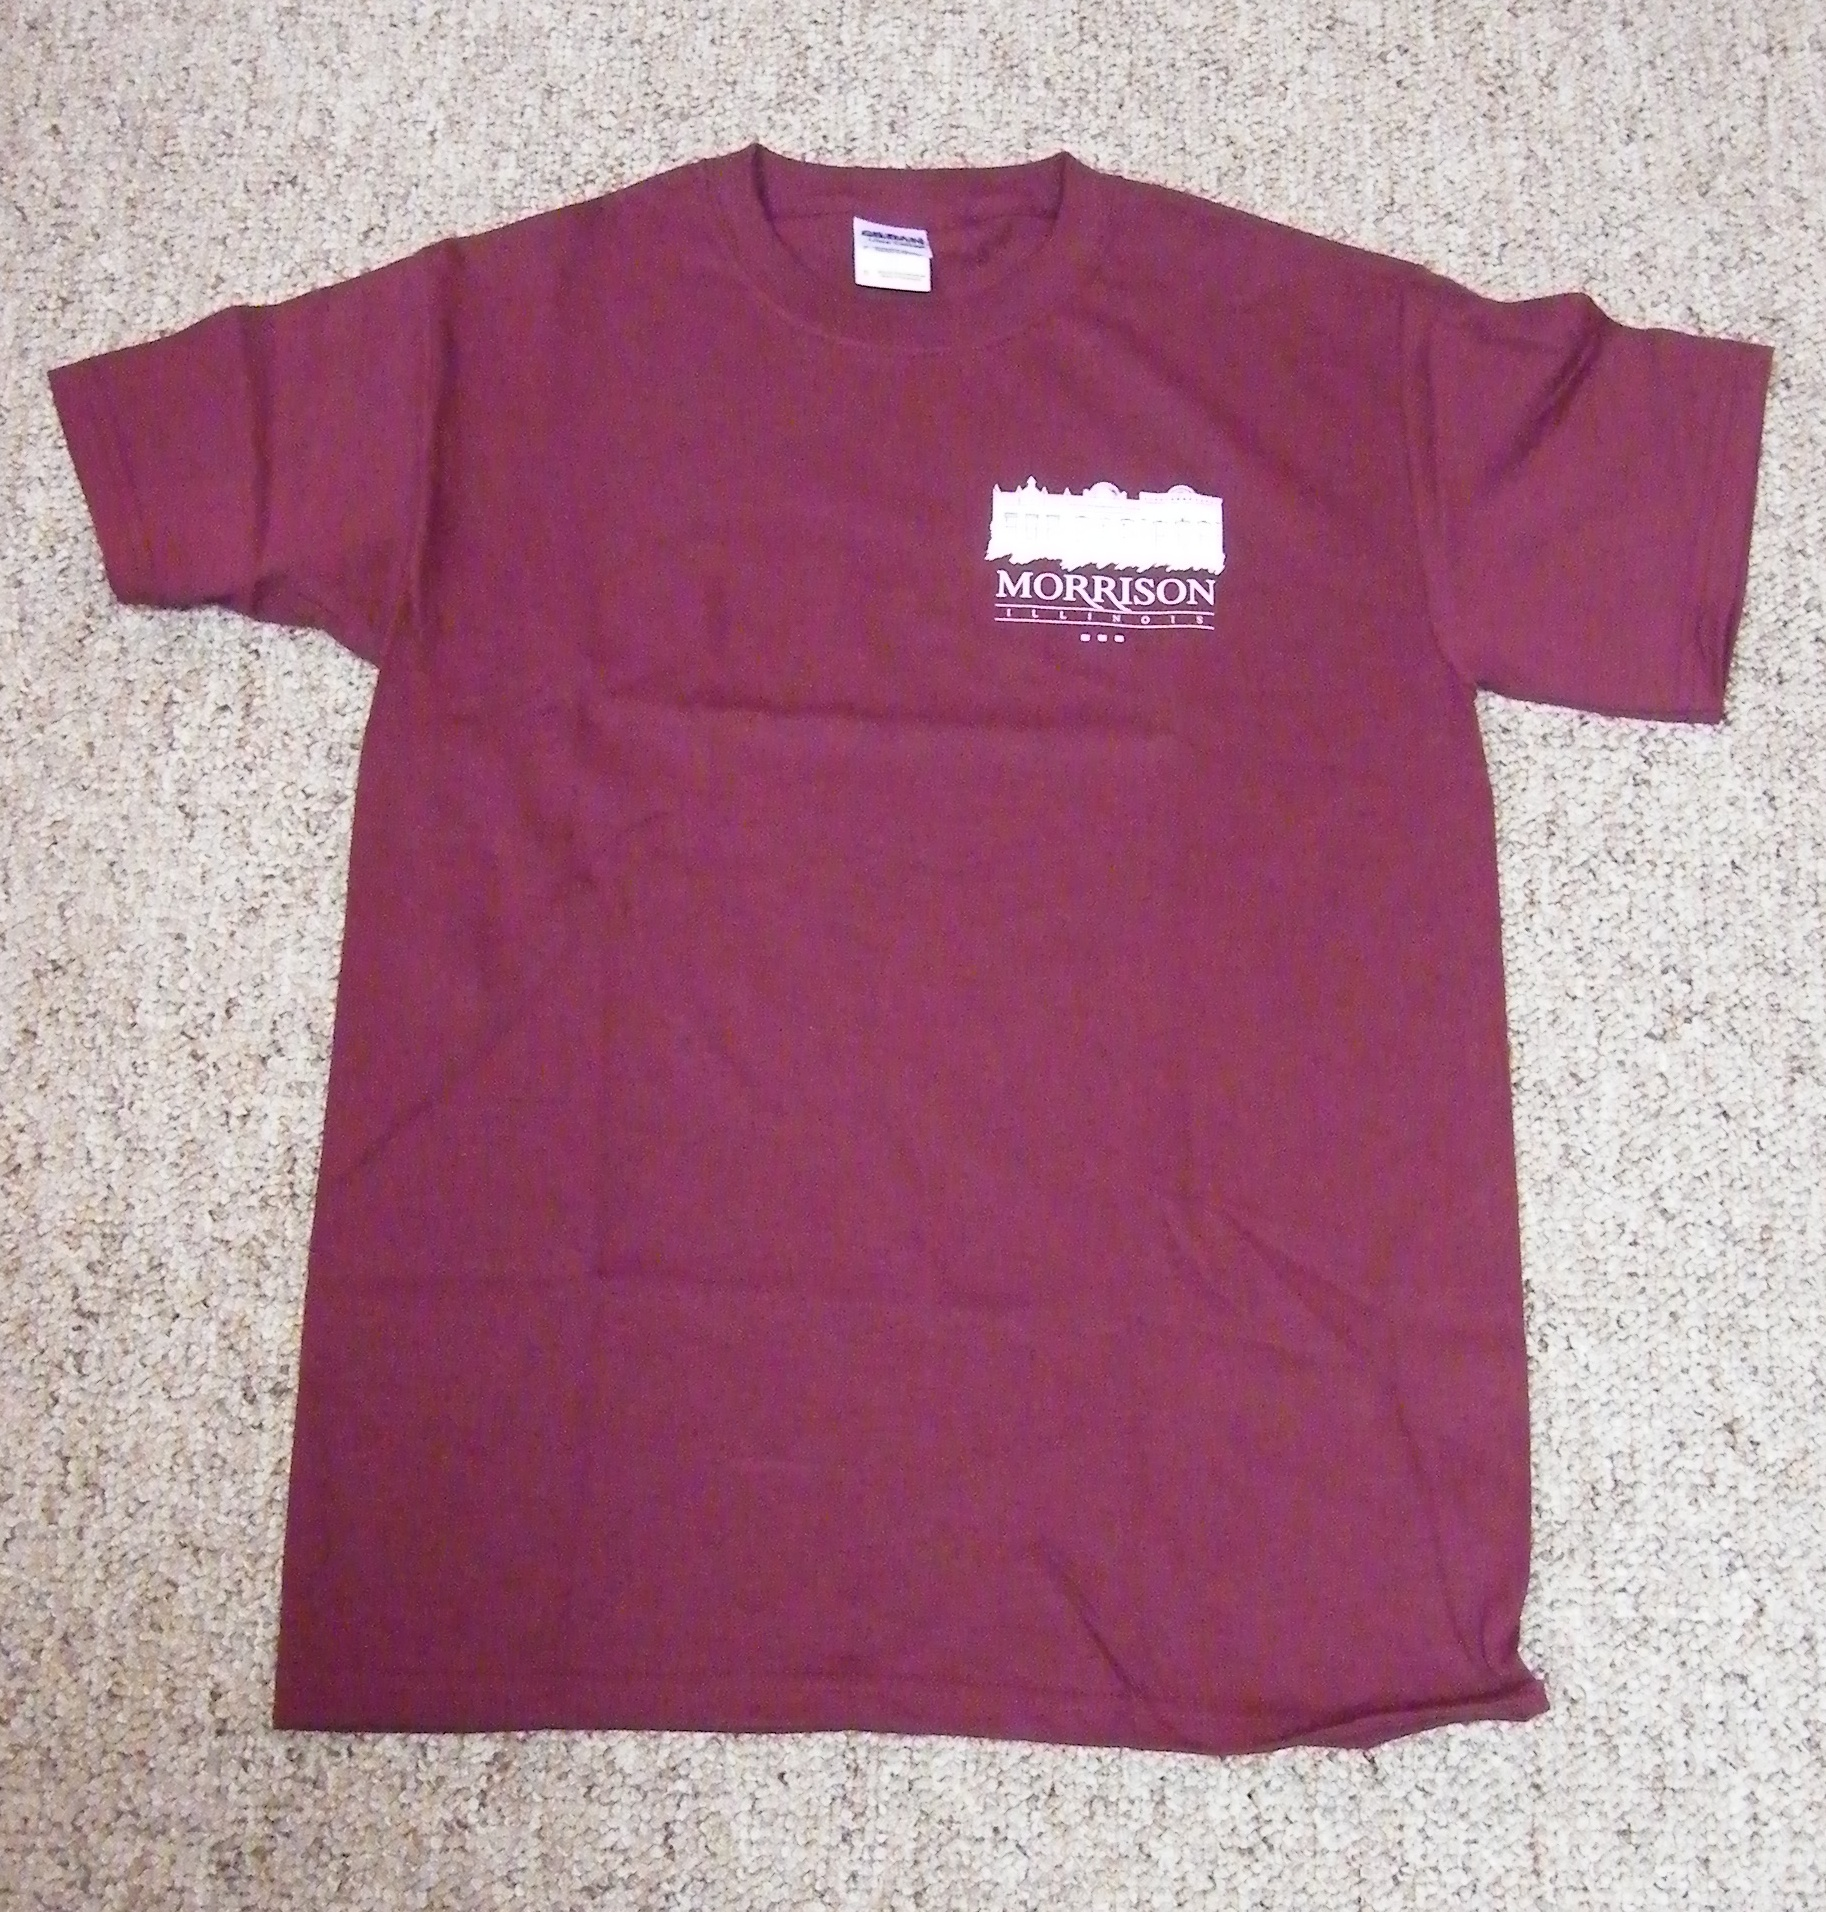 T-Shirts (short & long sleeved)